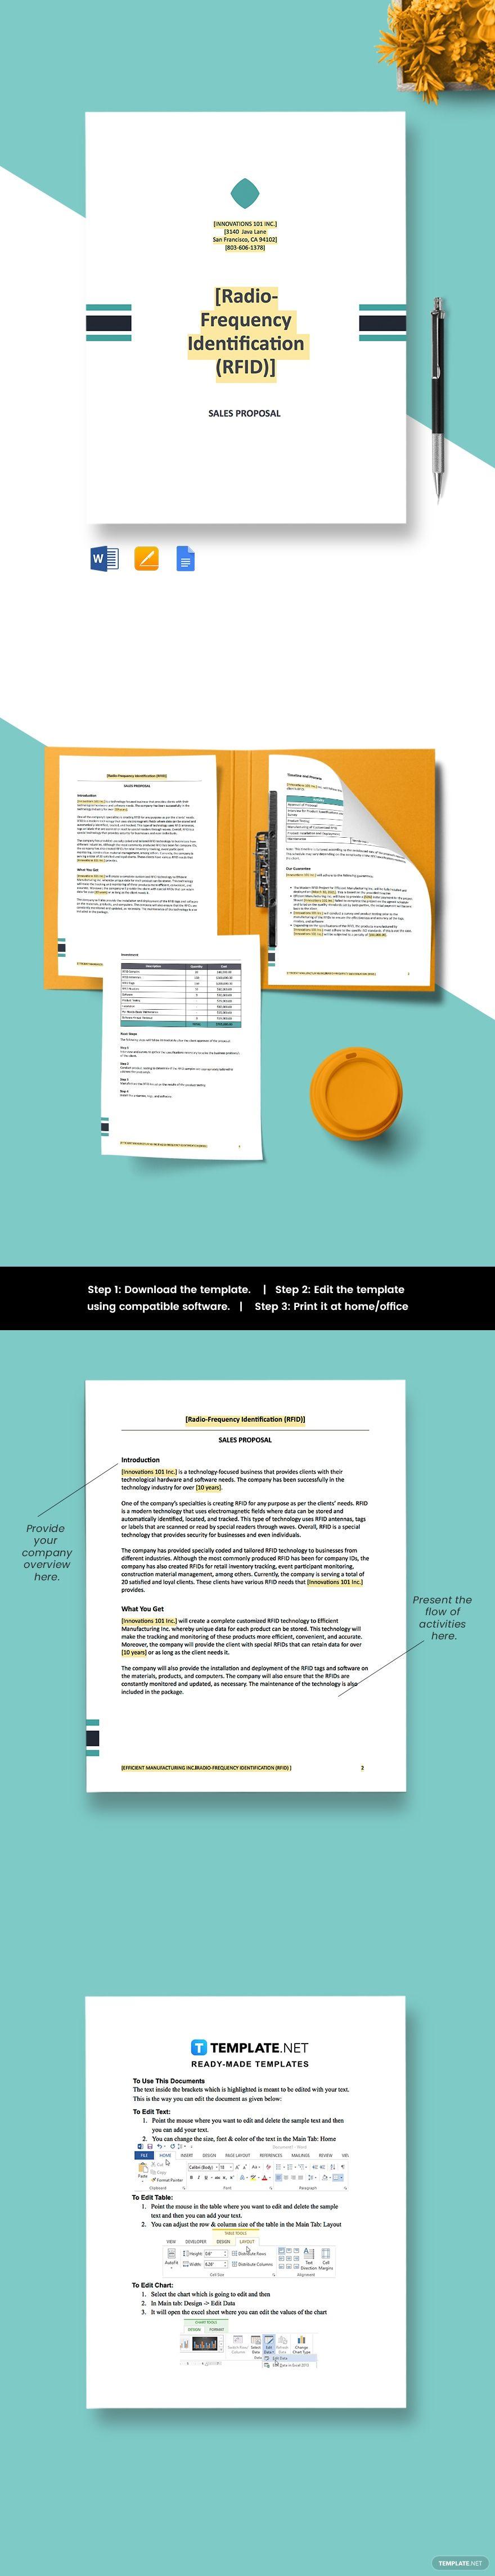 Sales Proposal Template Free Pdf Google Docs Word Apple Pages Pdf Template Net Sales Proposal Proposal Templates Proposal